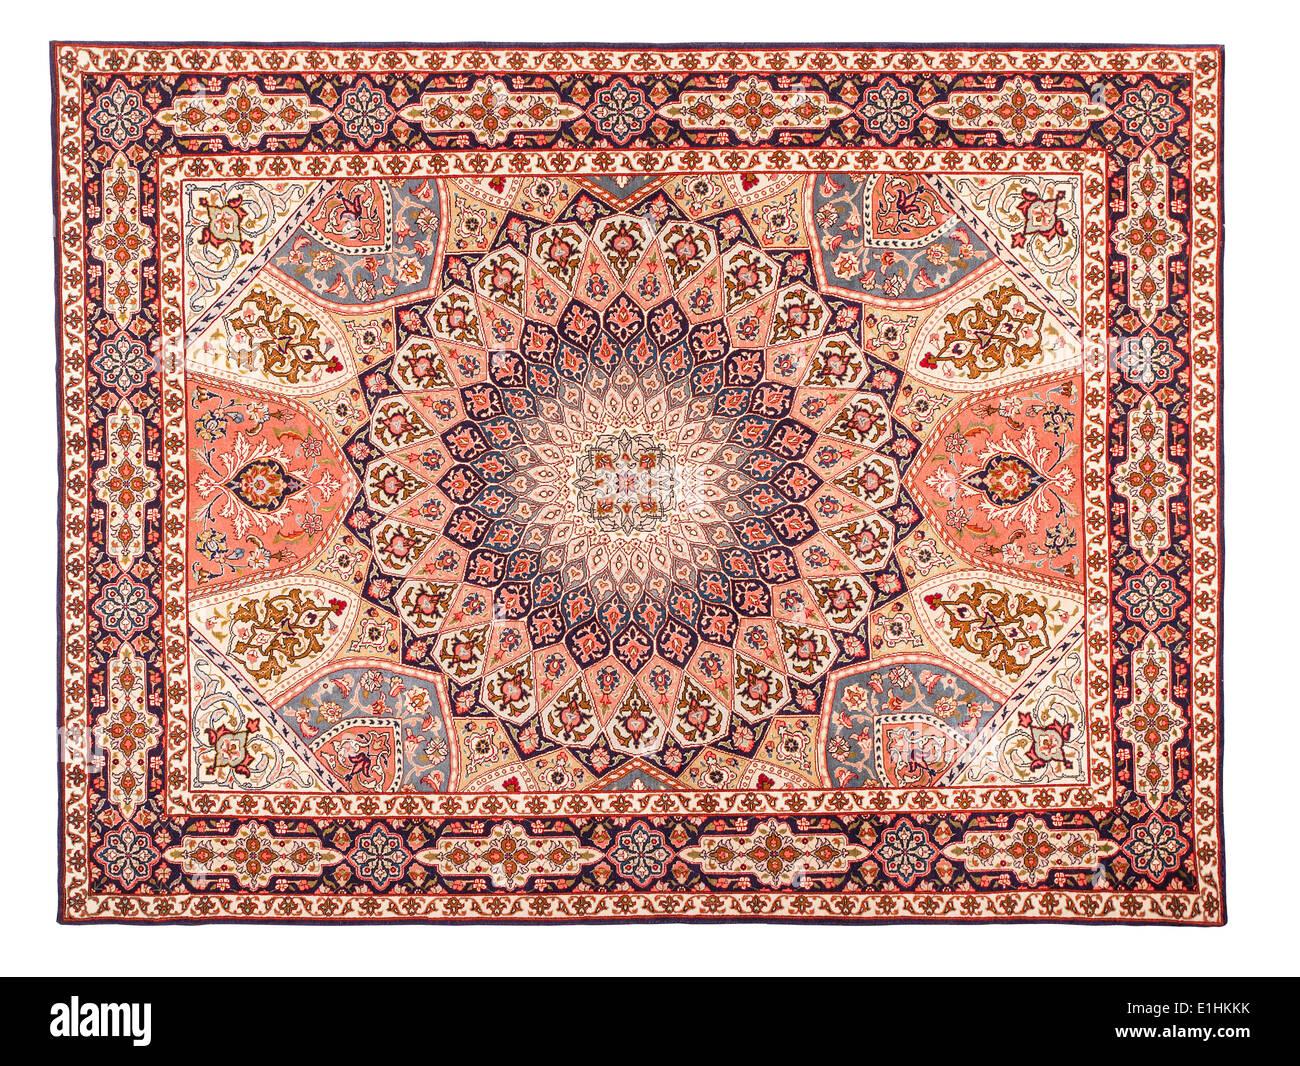 Asian Carpet Texture. Classic Arabic Pattern - Stock Image